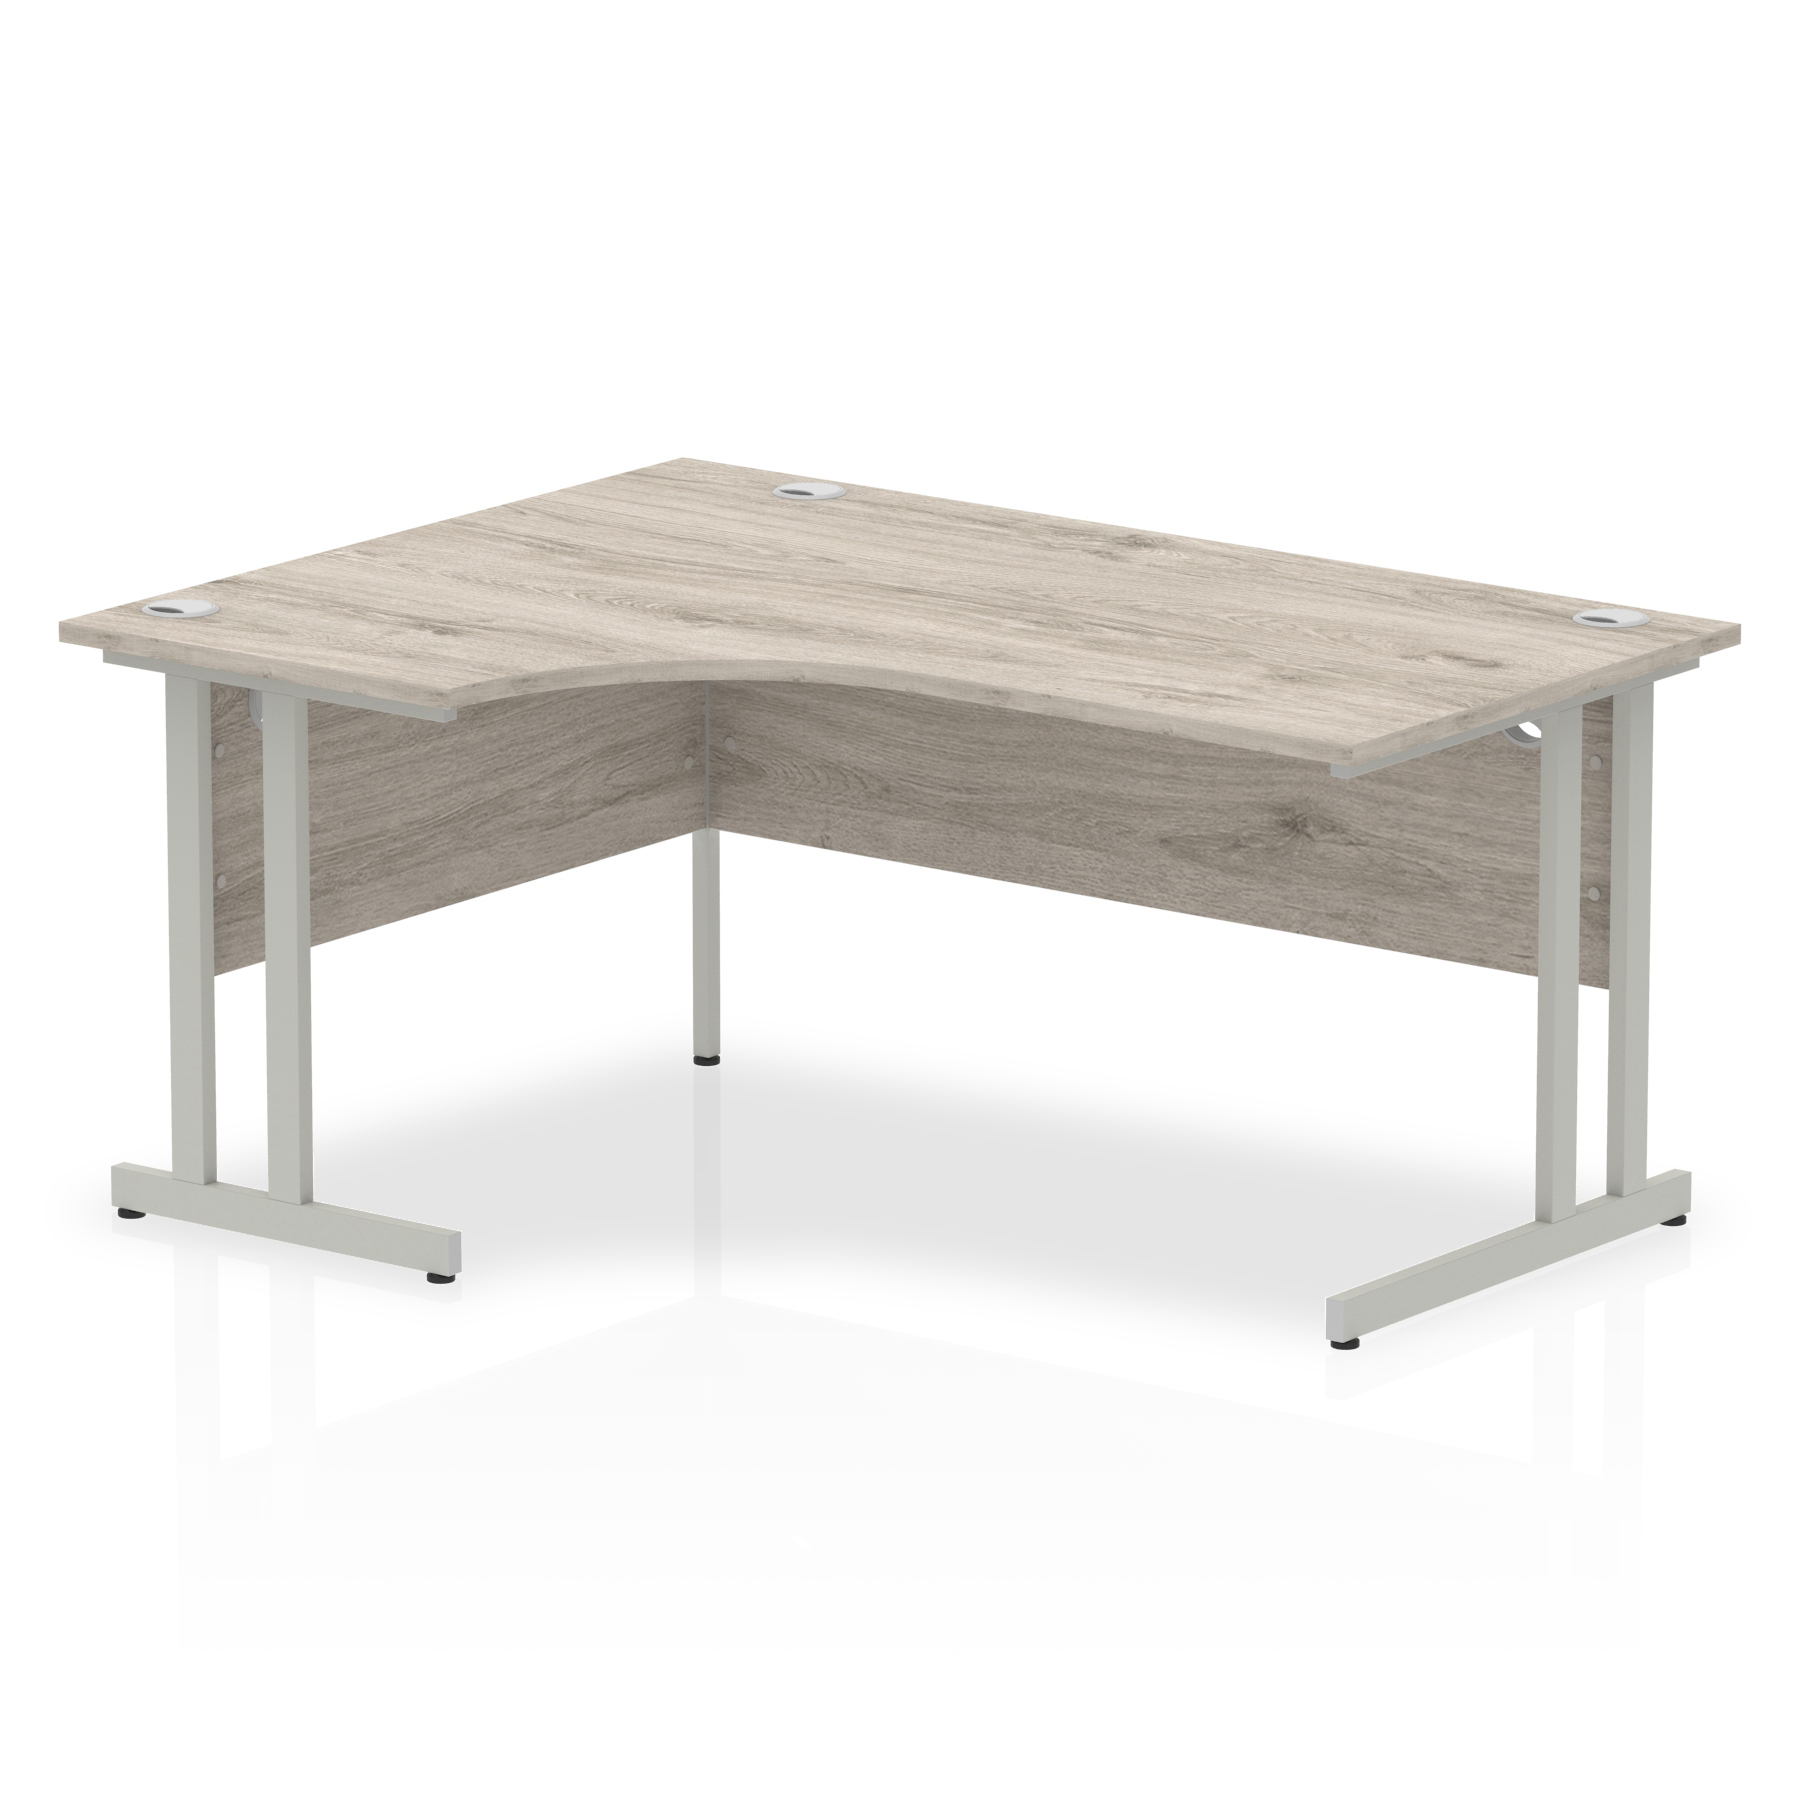 Trexus Radial Desk Left Hand Silver Cantilever Leg 1600mm Grey Oak Ref I003136